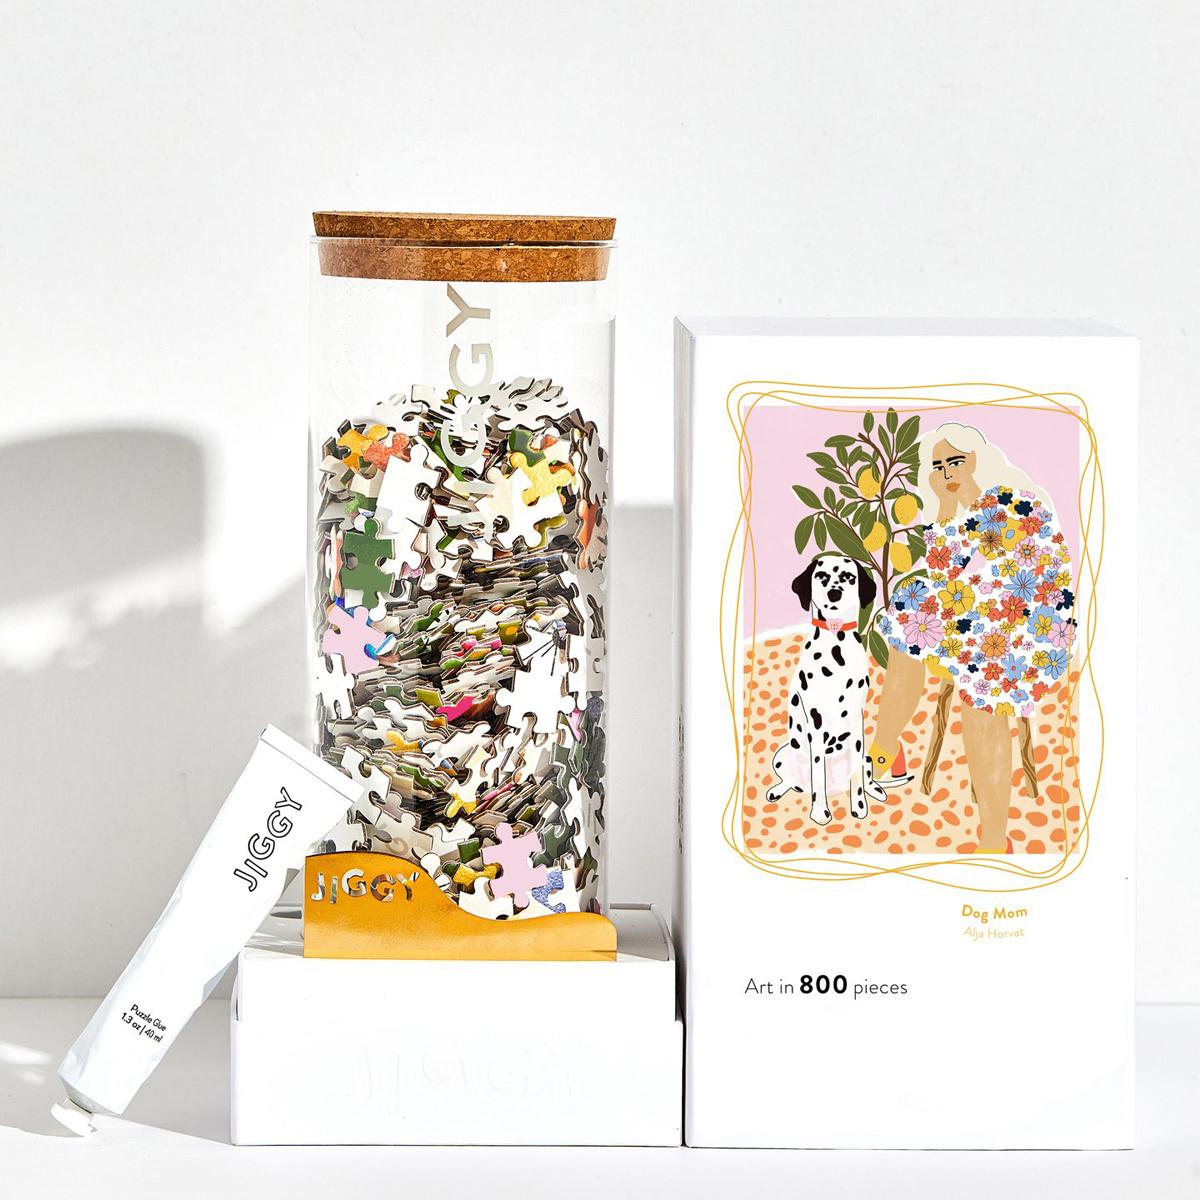 Jiggy Jiggy - Dog Mom 800-Piece Puzzle & Frameable Art